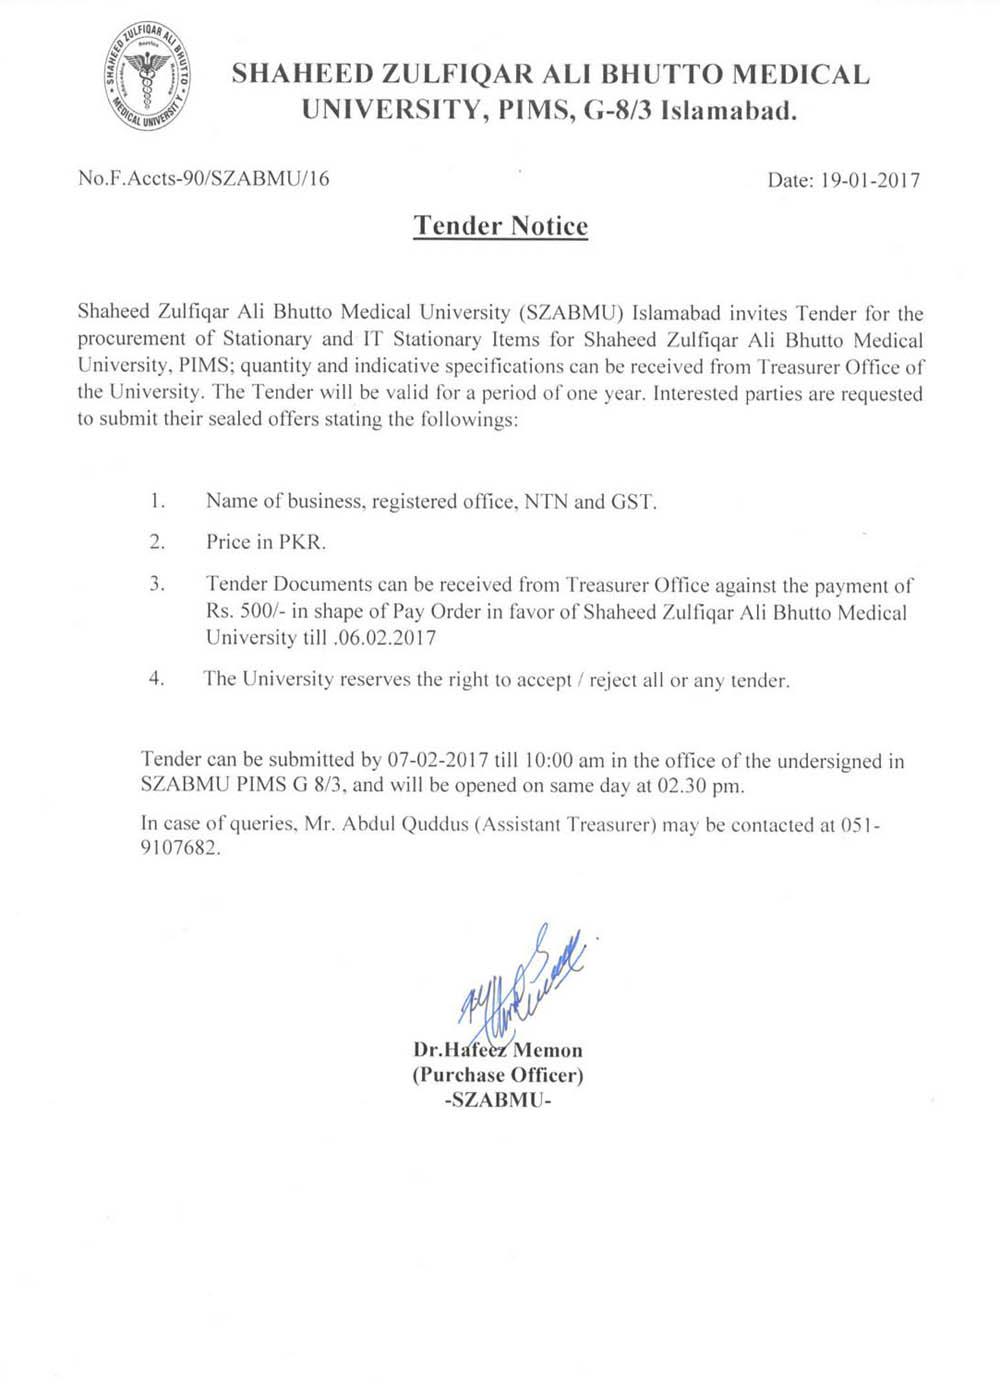 worksheet Combined Gas Law Problems Worksheet tenders shaheed zulfiqar ali bhutto medical university szabmu tender notice 19 january 2017